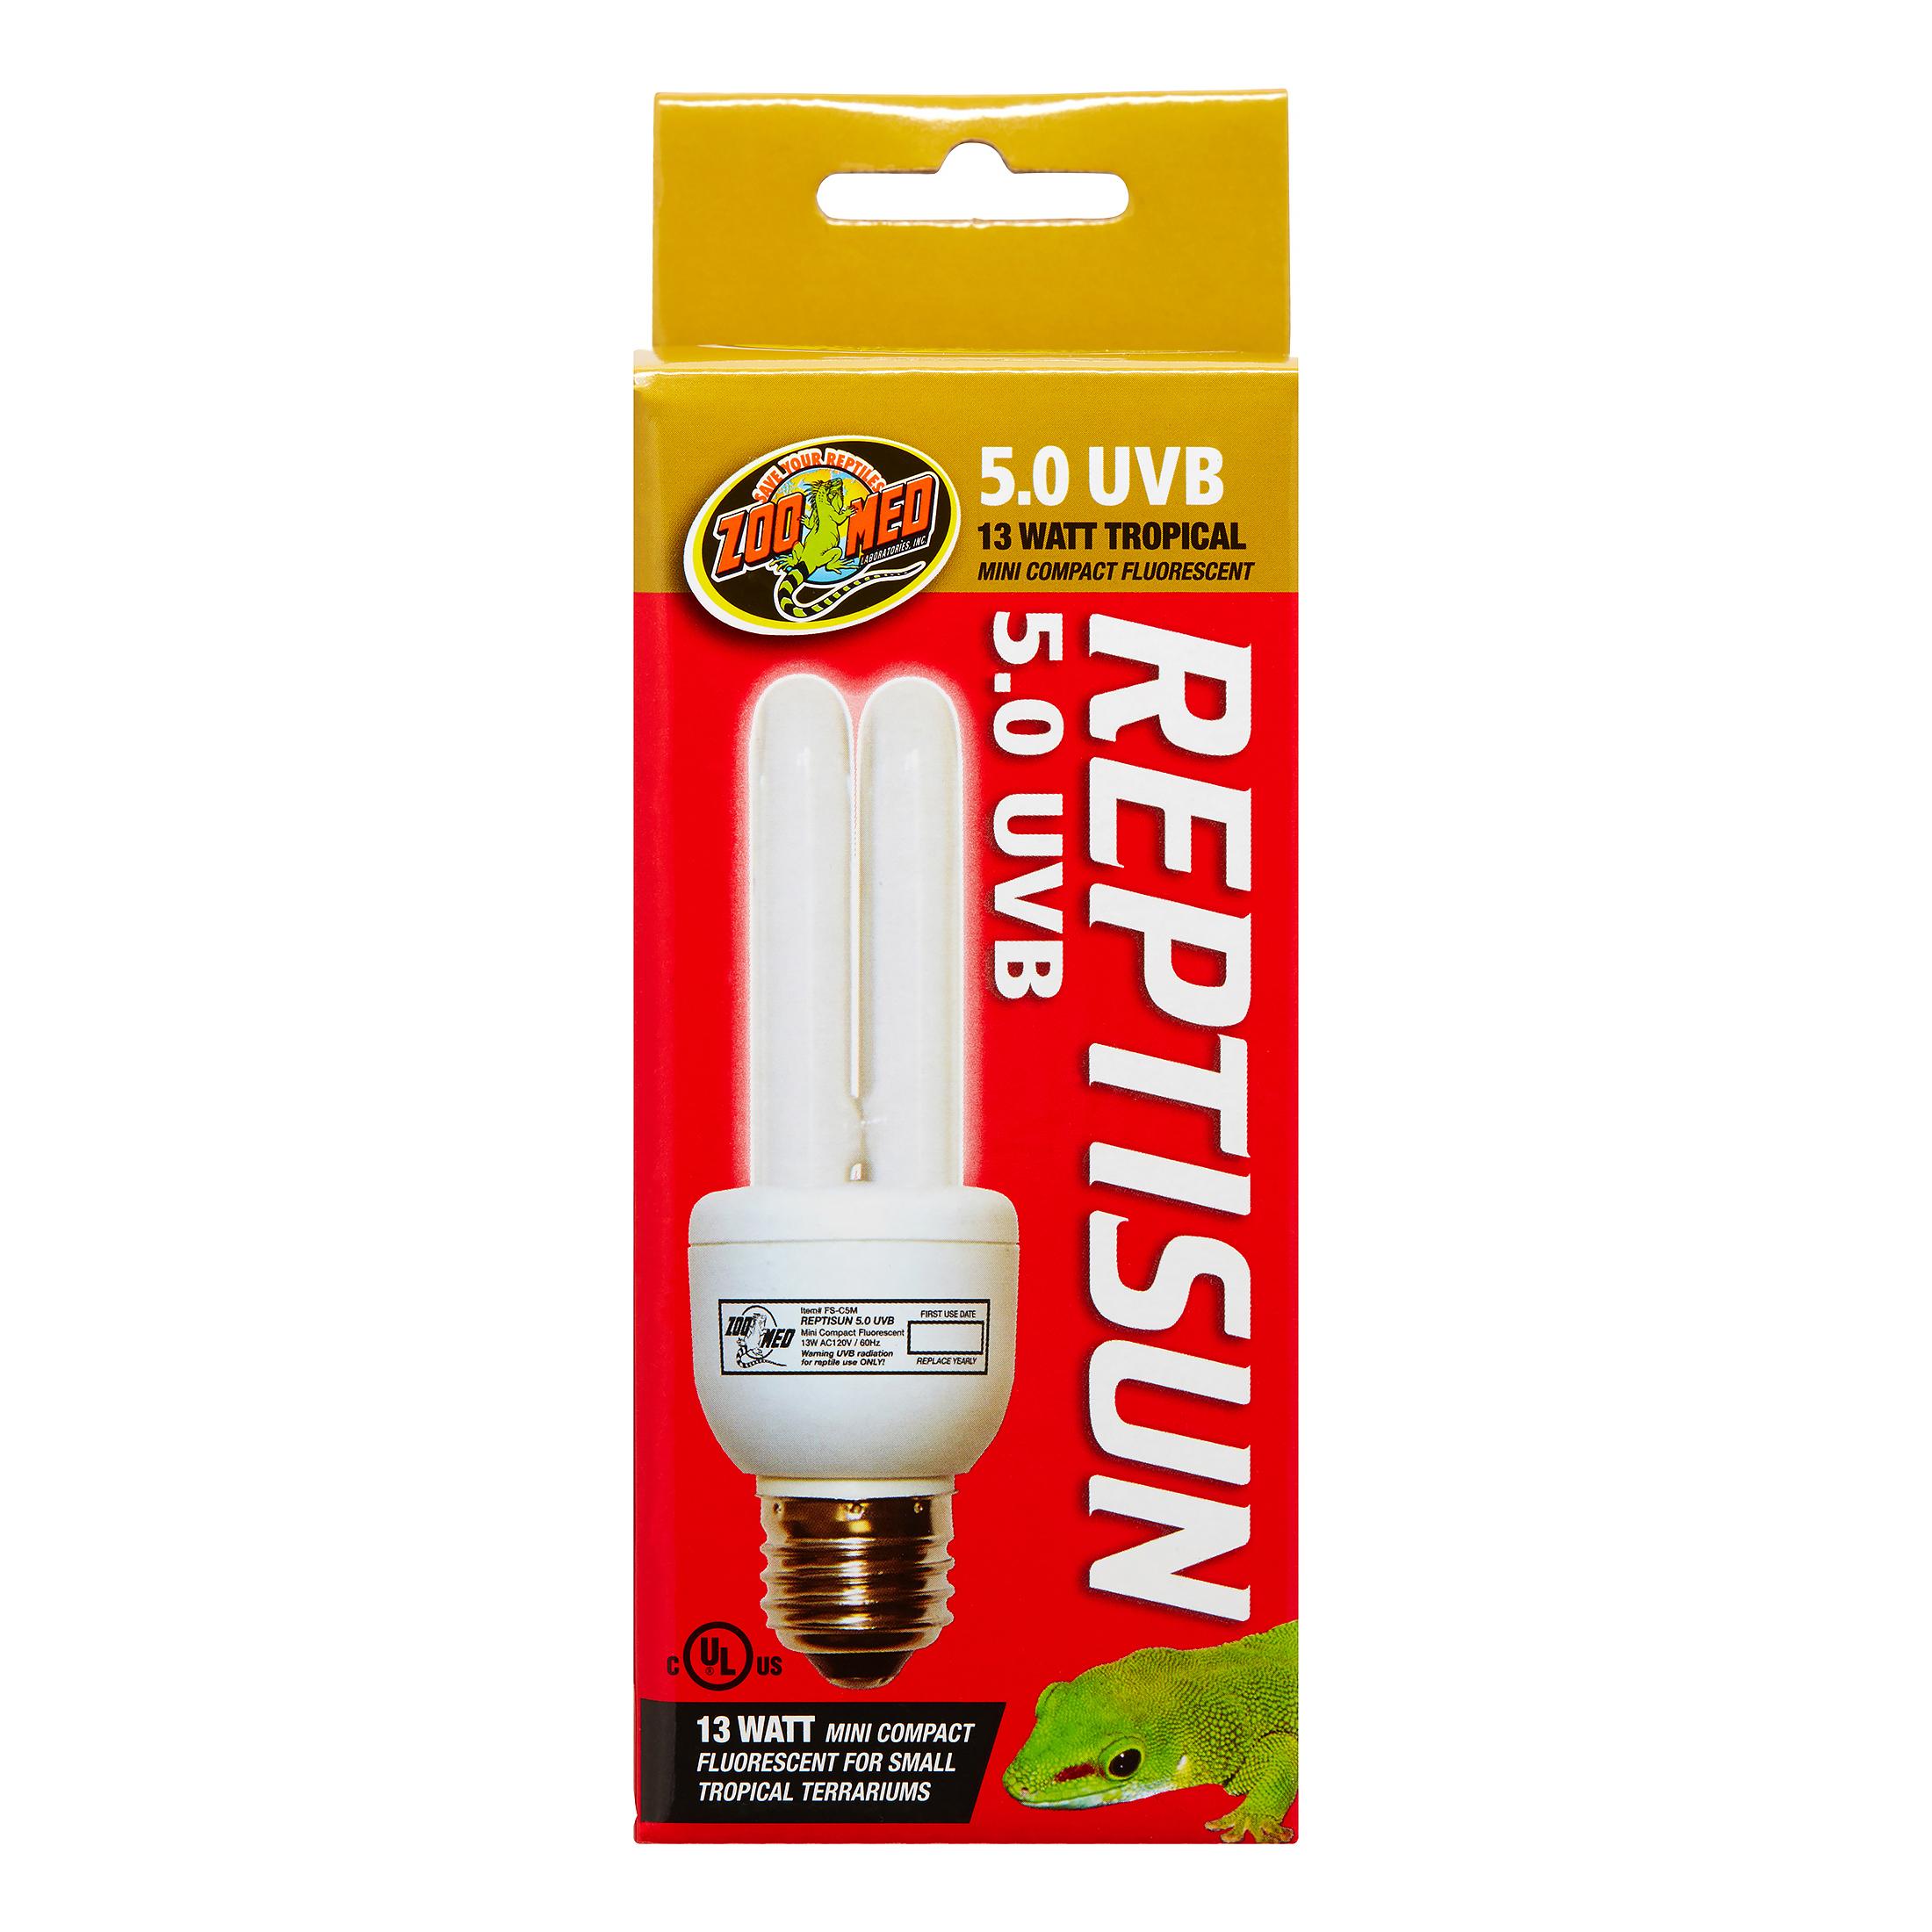 Zoo Med ReptiSun 5.0 Mini Compact Fluorescent Bulb, 13 Watt